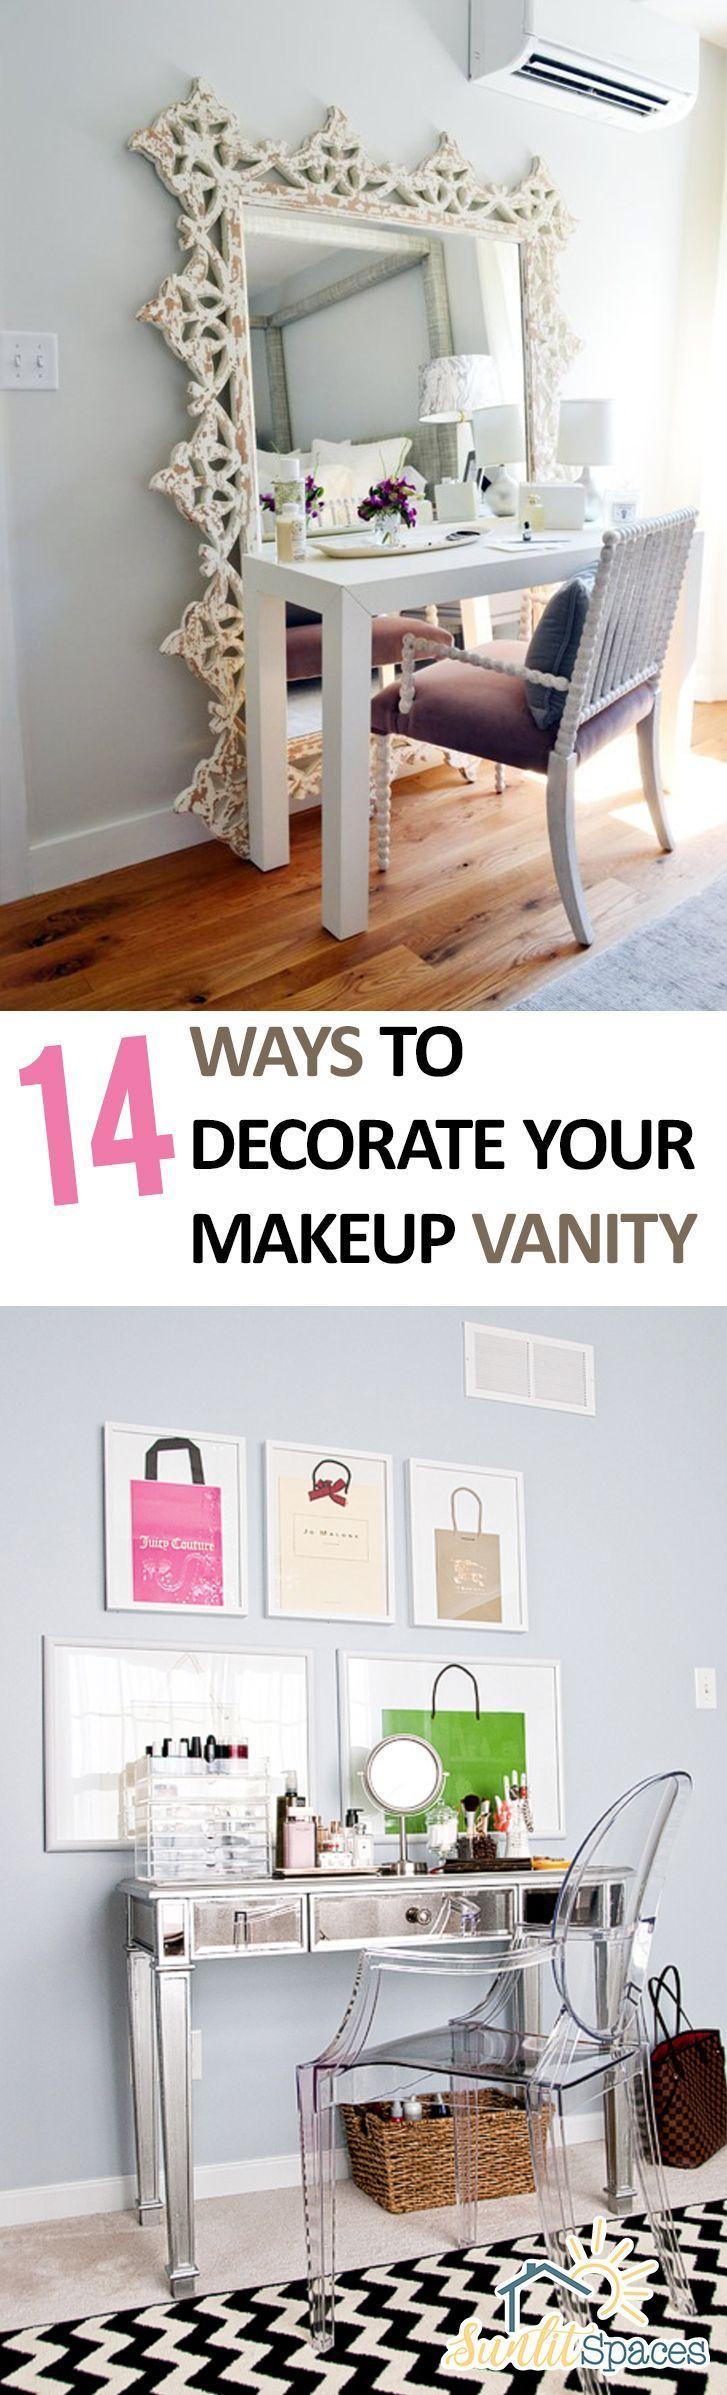 Makeup Vanity, How to Decorate Your Makeup Vanity, Home Decor Ideas, DIY Makeup Vanity, Makeup Vanity Ideas, Makeup Tips and Tricks, Decorating, Bathroom Decor, Popular Pin